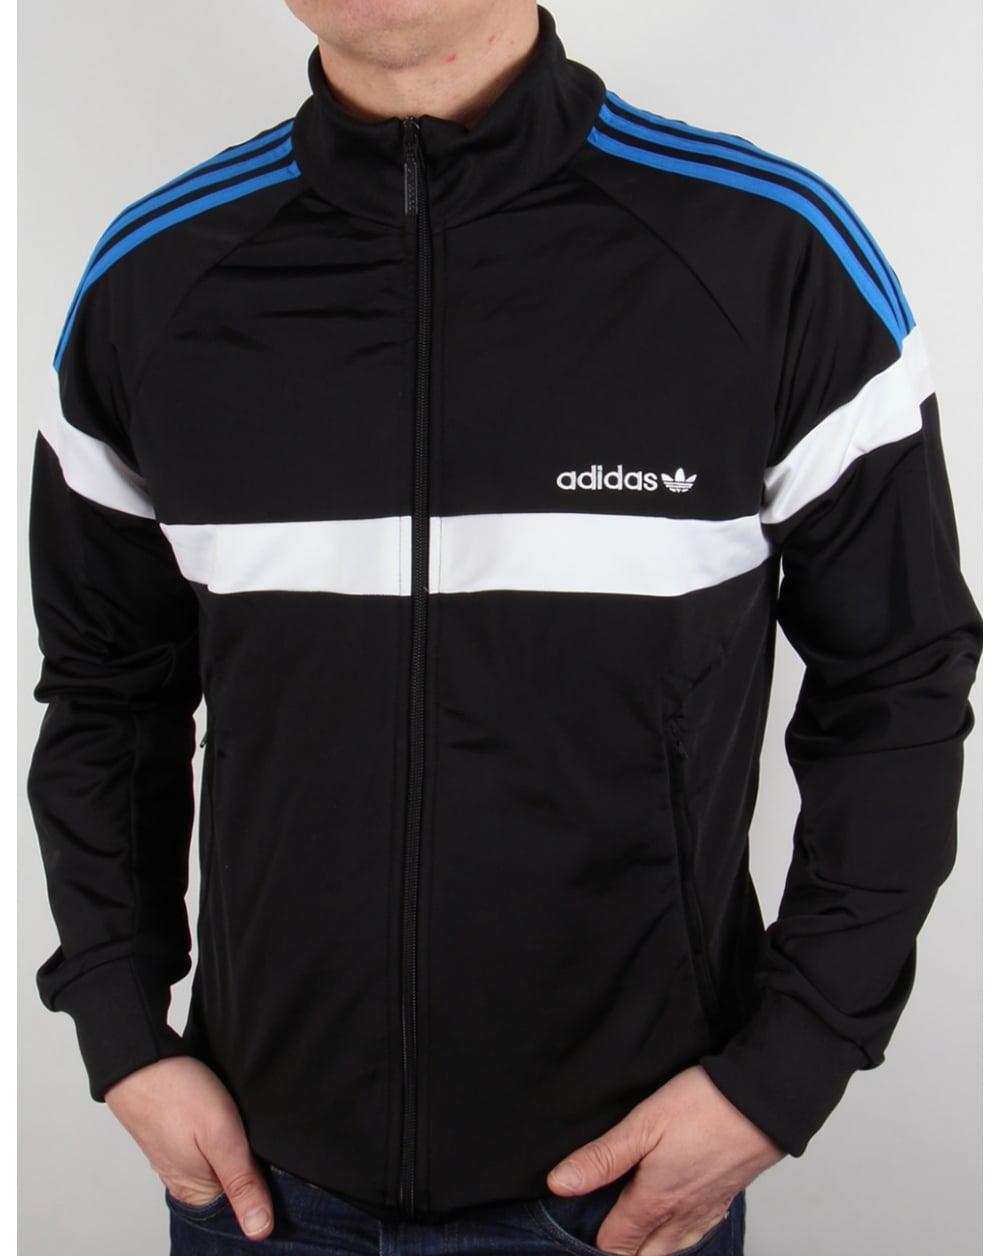 Adidas Top Ten Hi Sleek Bow Zip Trainers: Adidas Originals Itasca Track Top Black/white,jacket,tracksuit